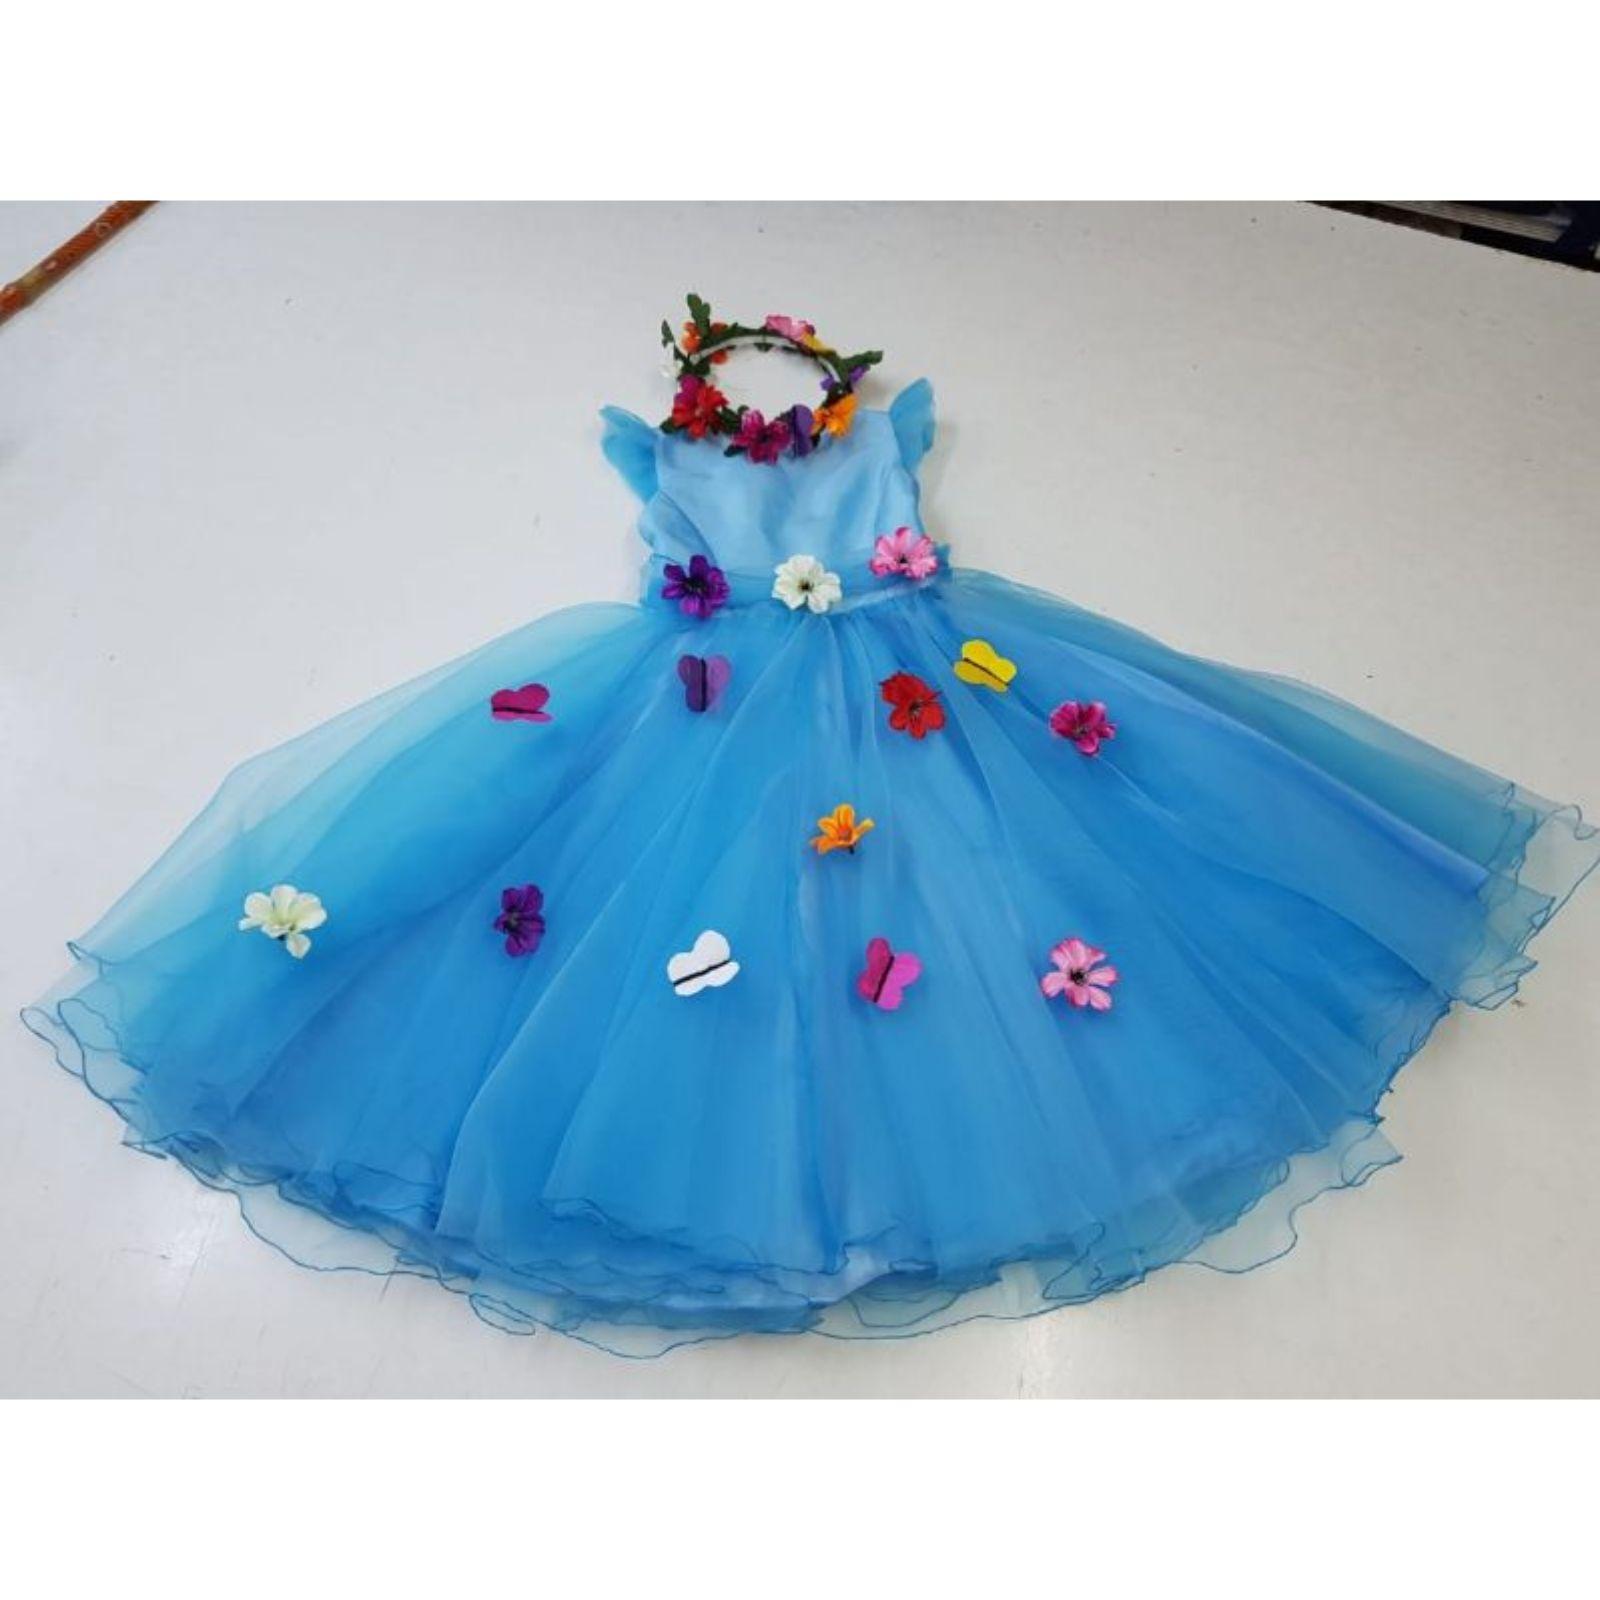 Prințesa bleu cu flori și fluturași